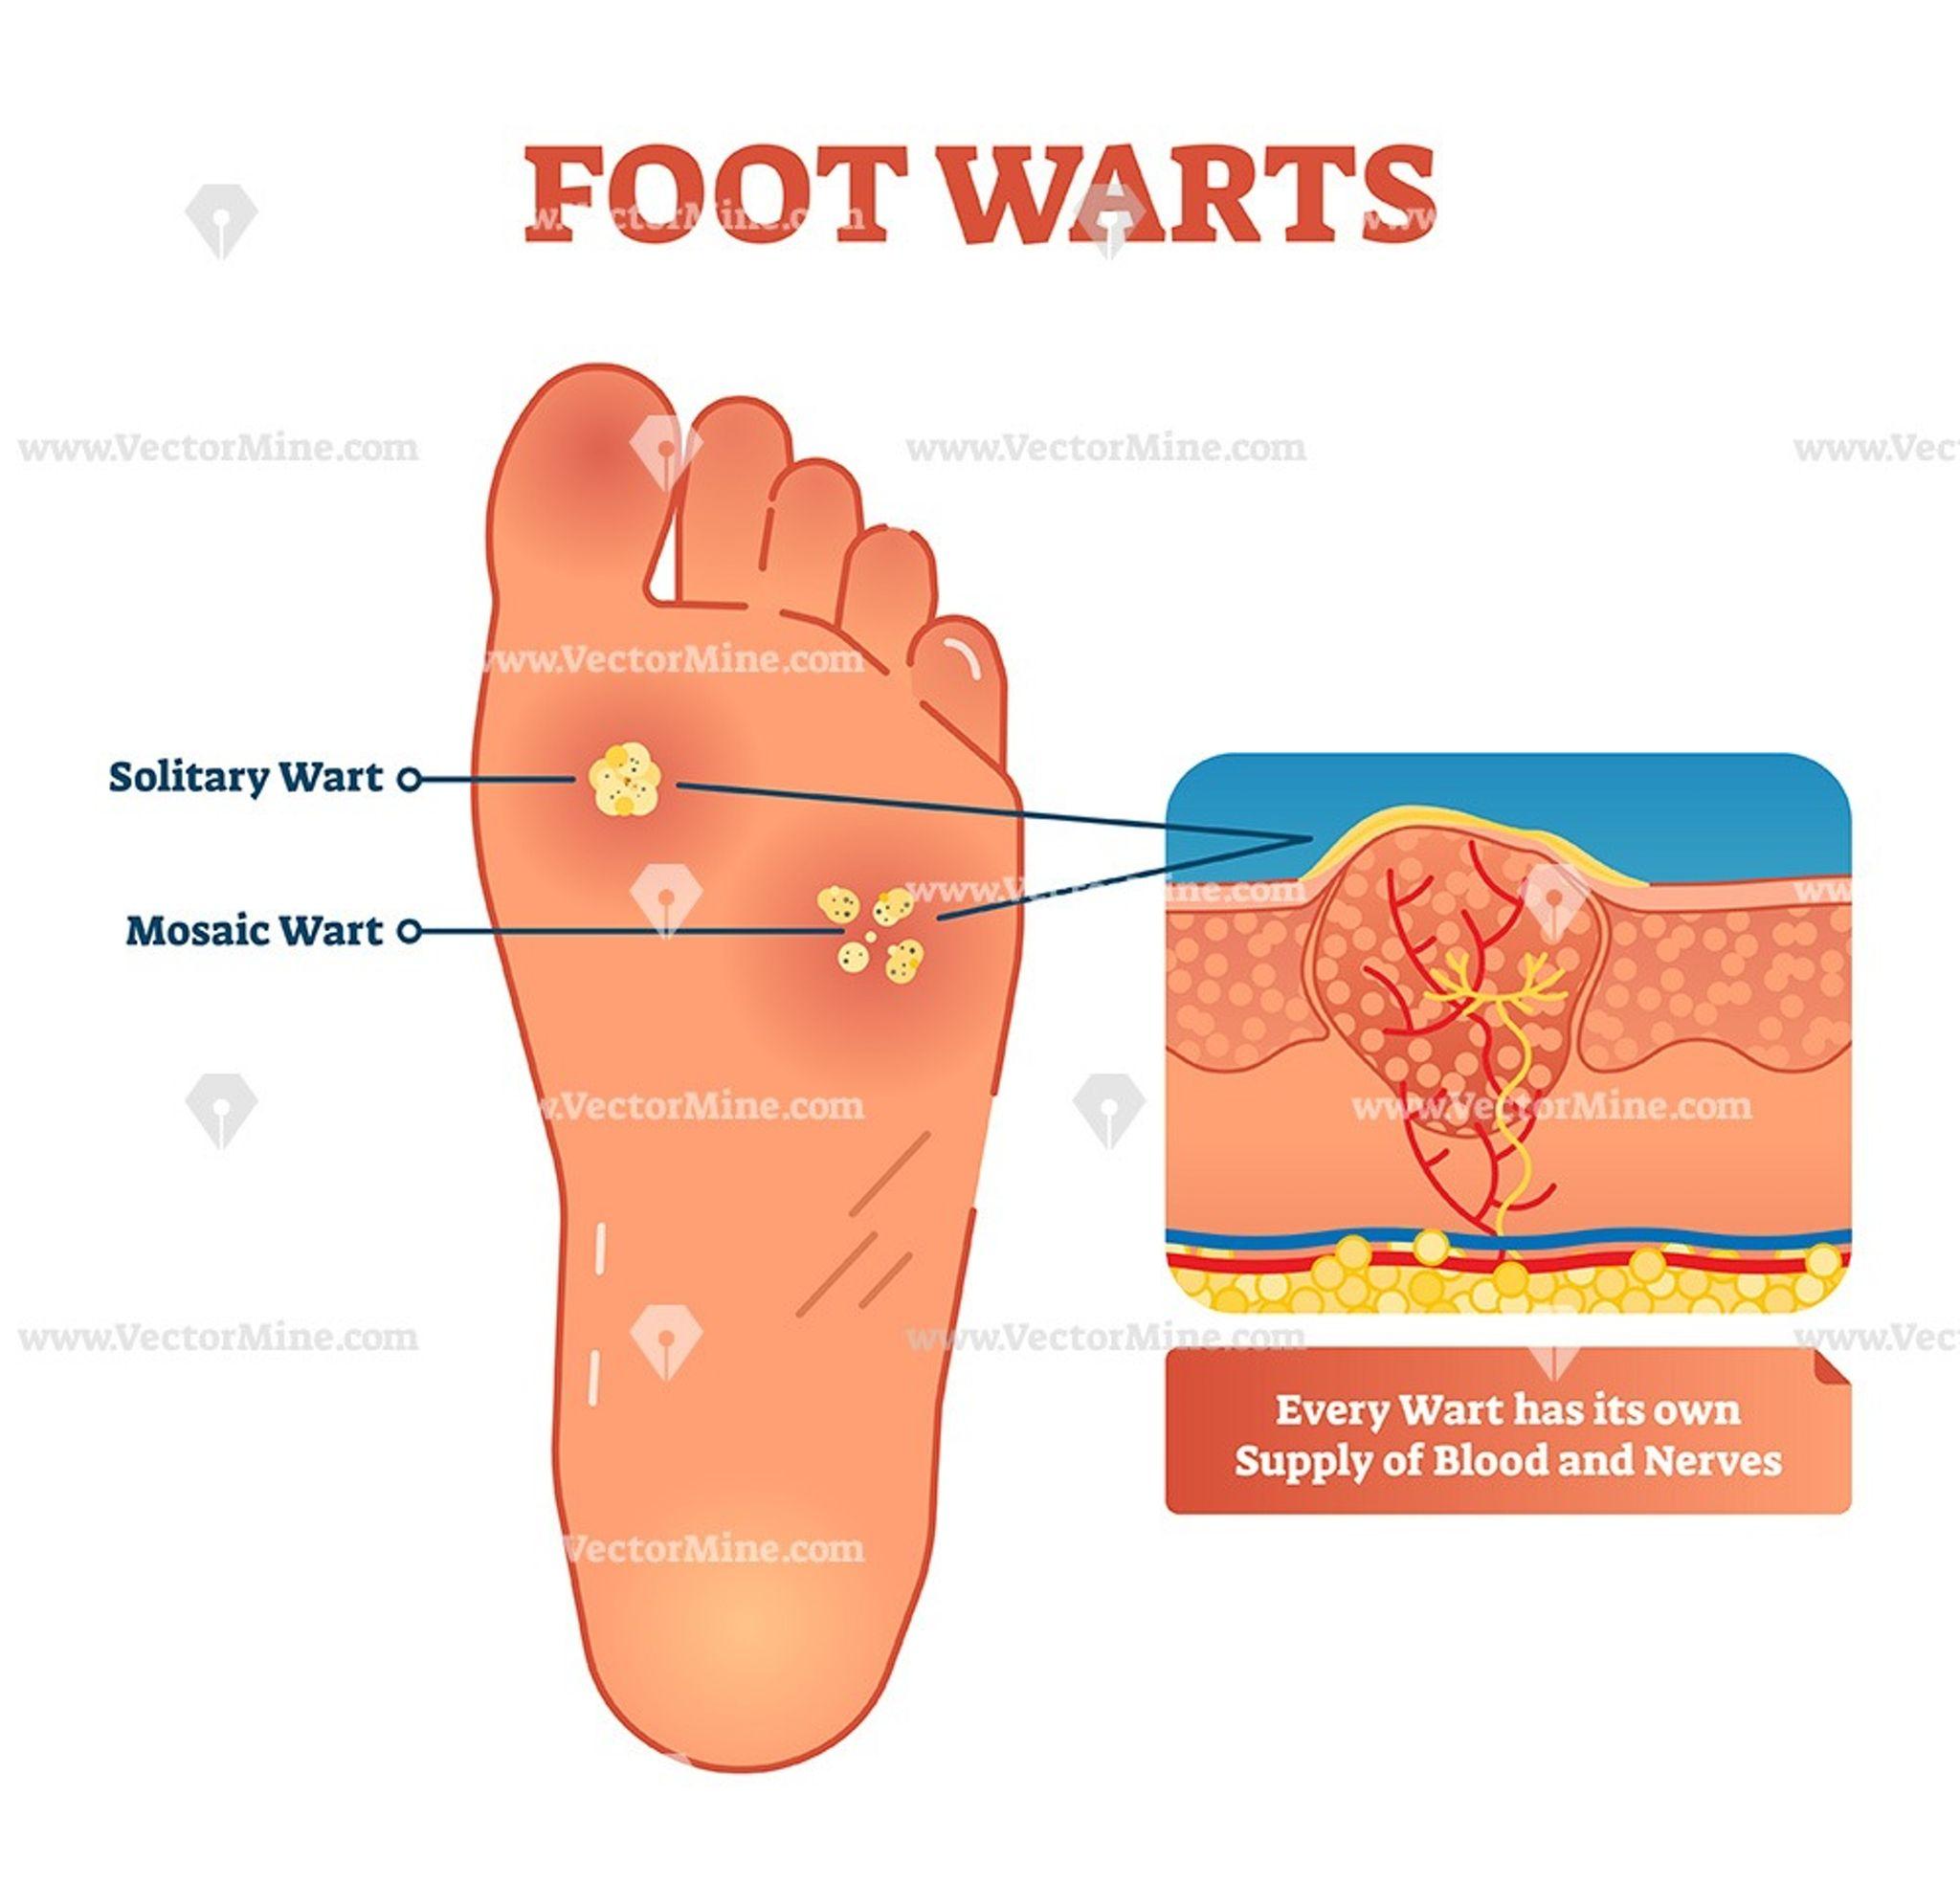 Foot wart diagram - Hpv life cycle diagram